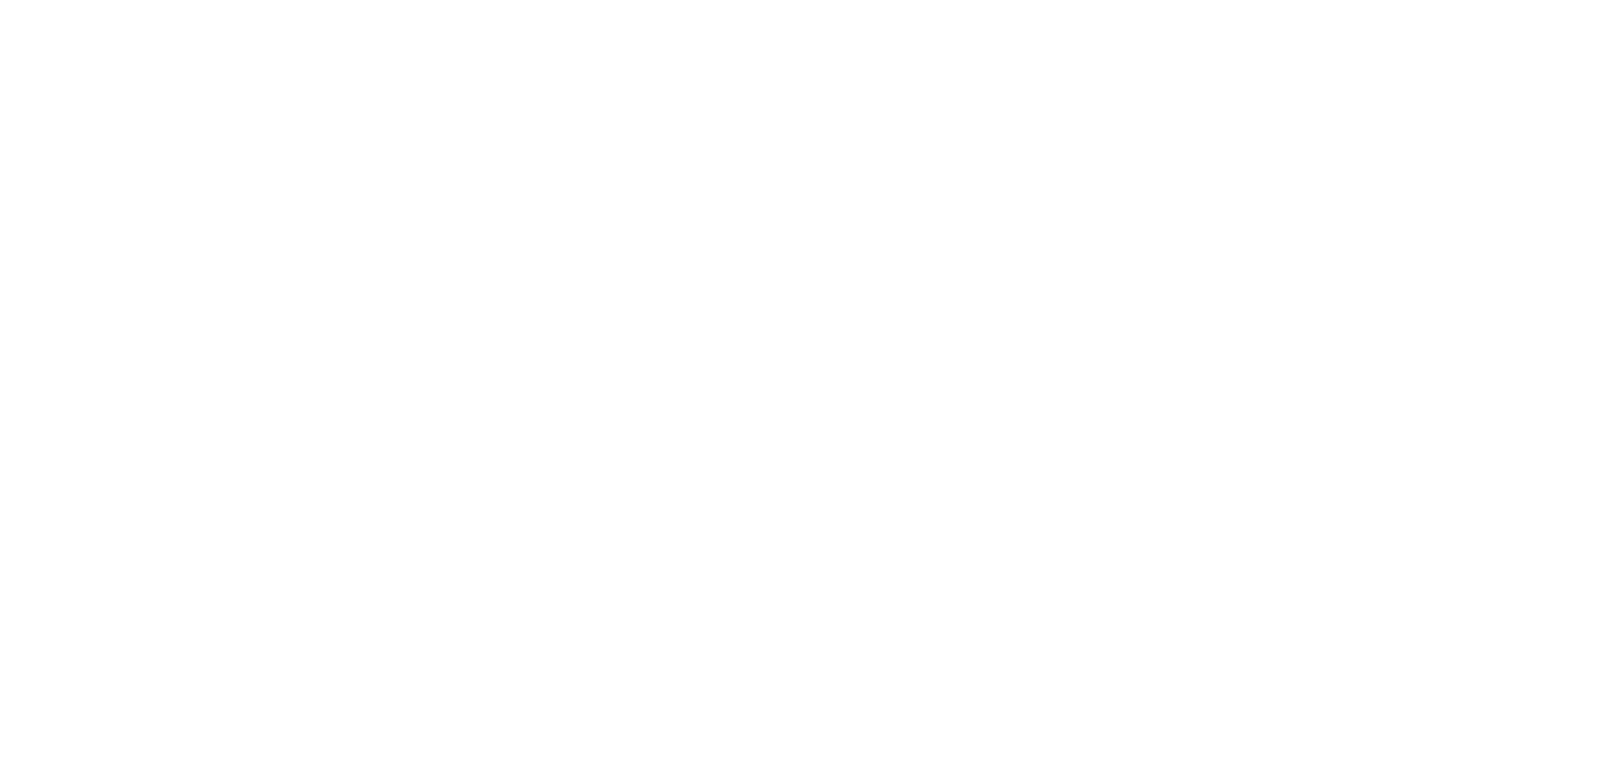 Mission Square Research Institute